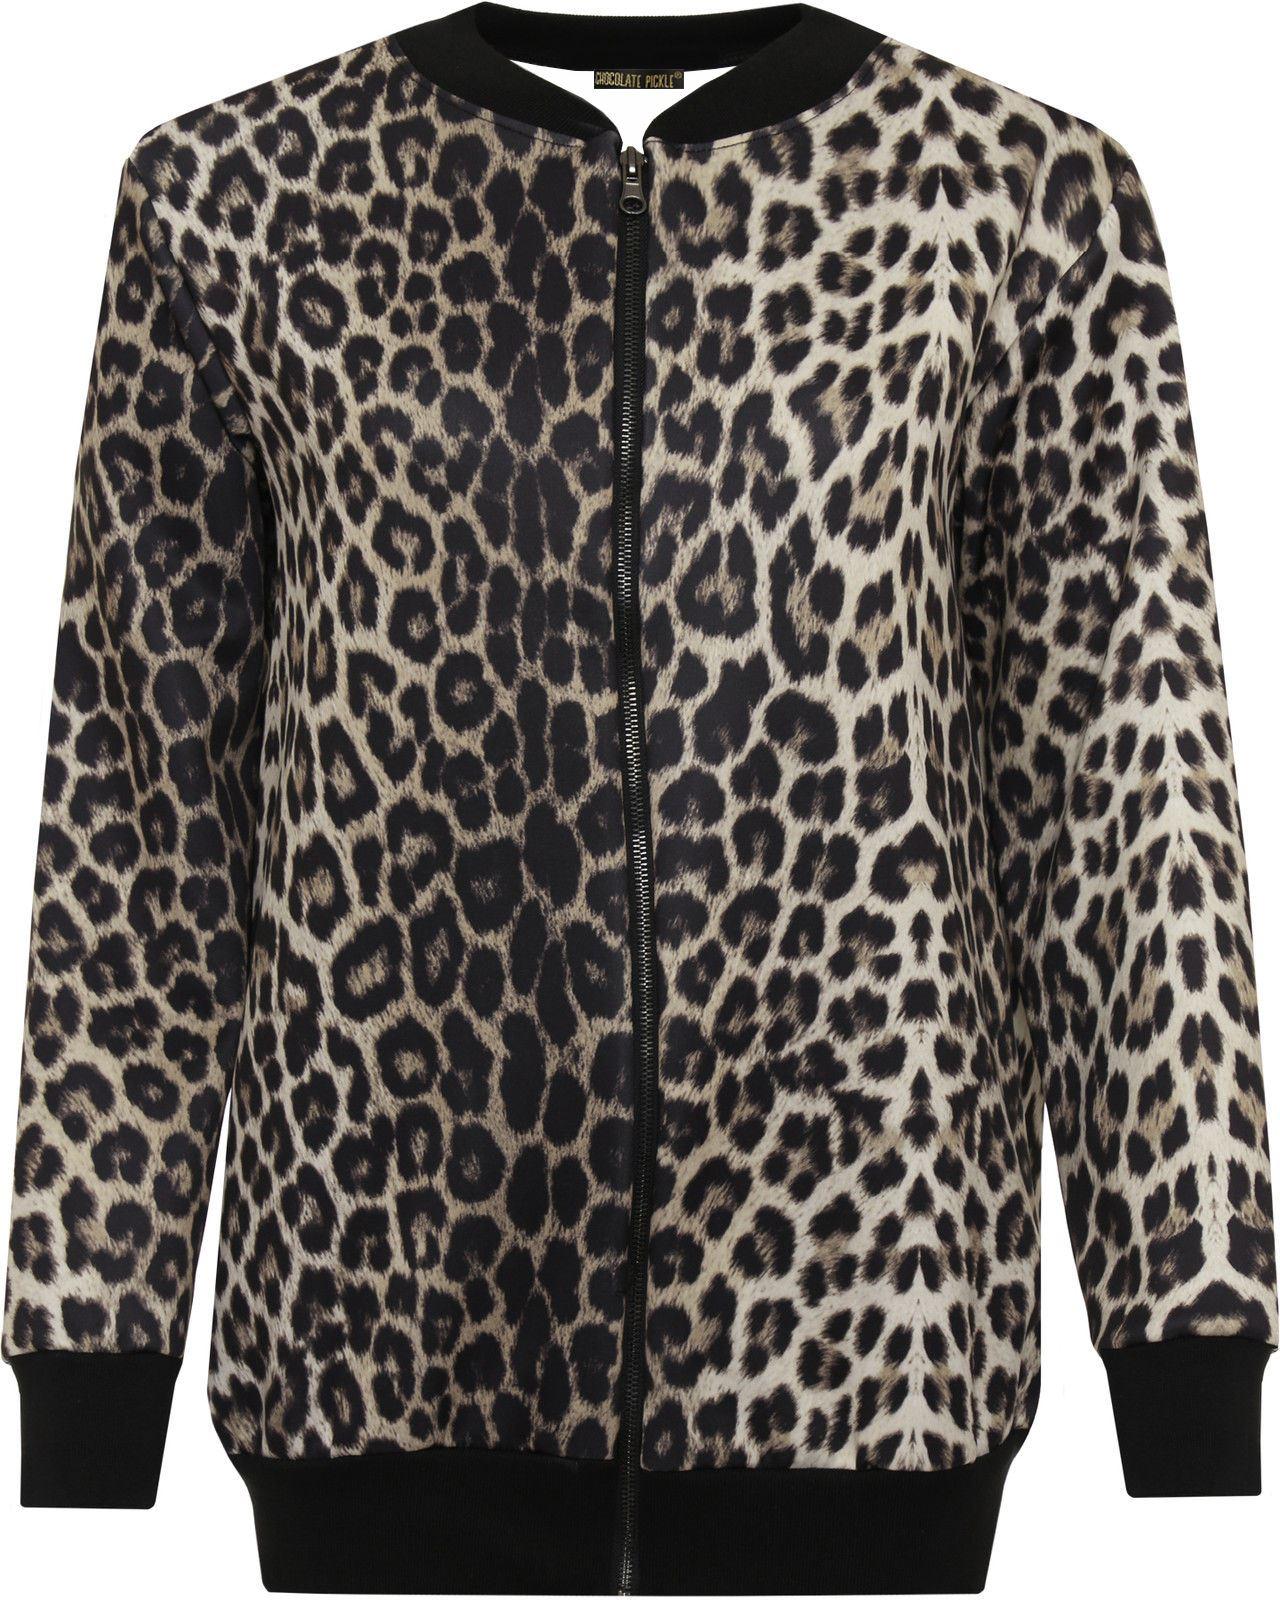 Leopard print coats for women